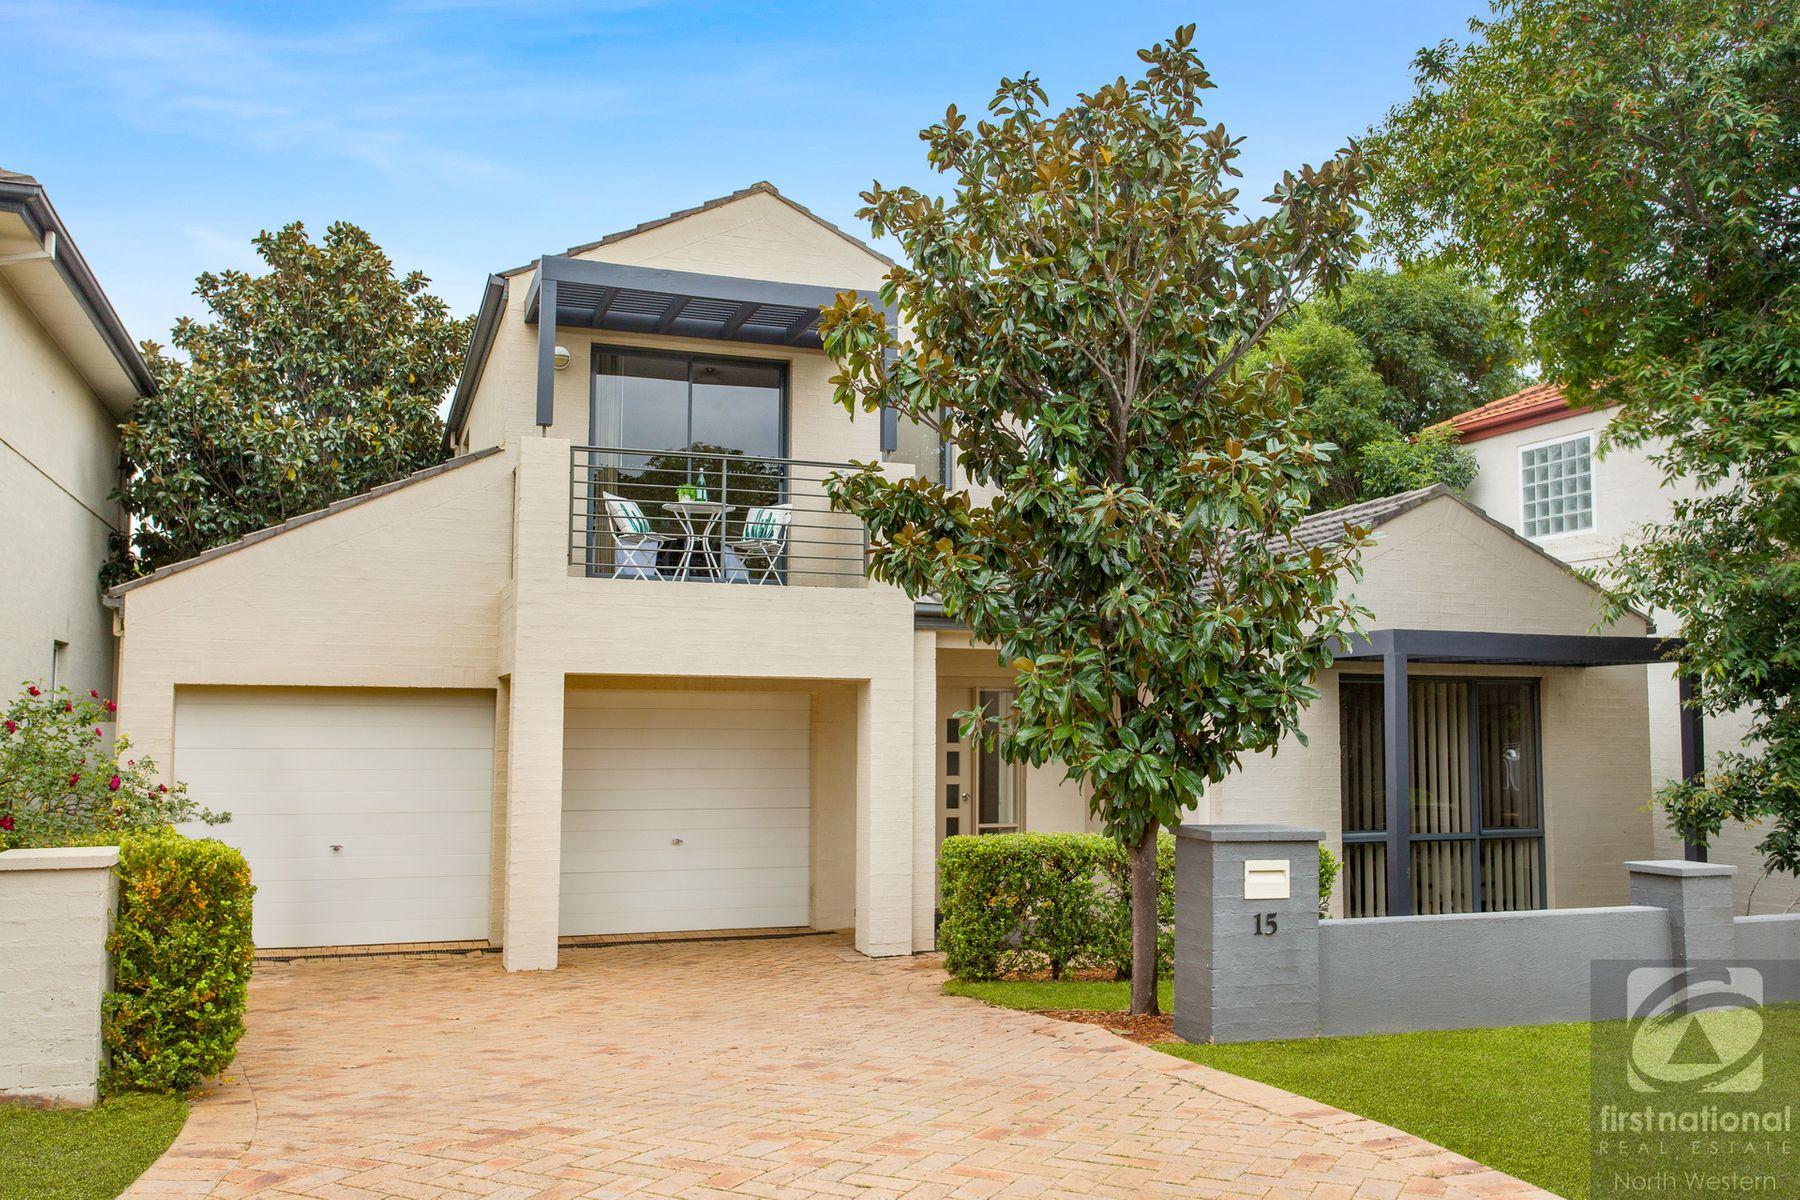 15 Rochdale Circuit, Stanhope Gardens, NSW 2768